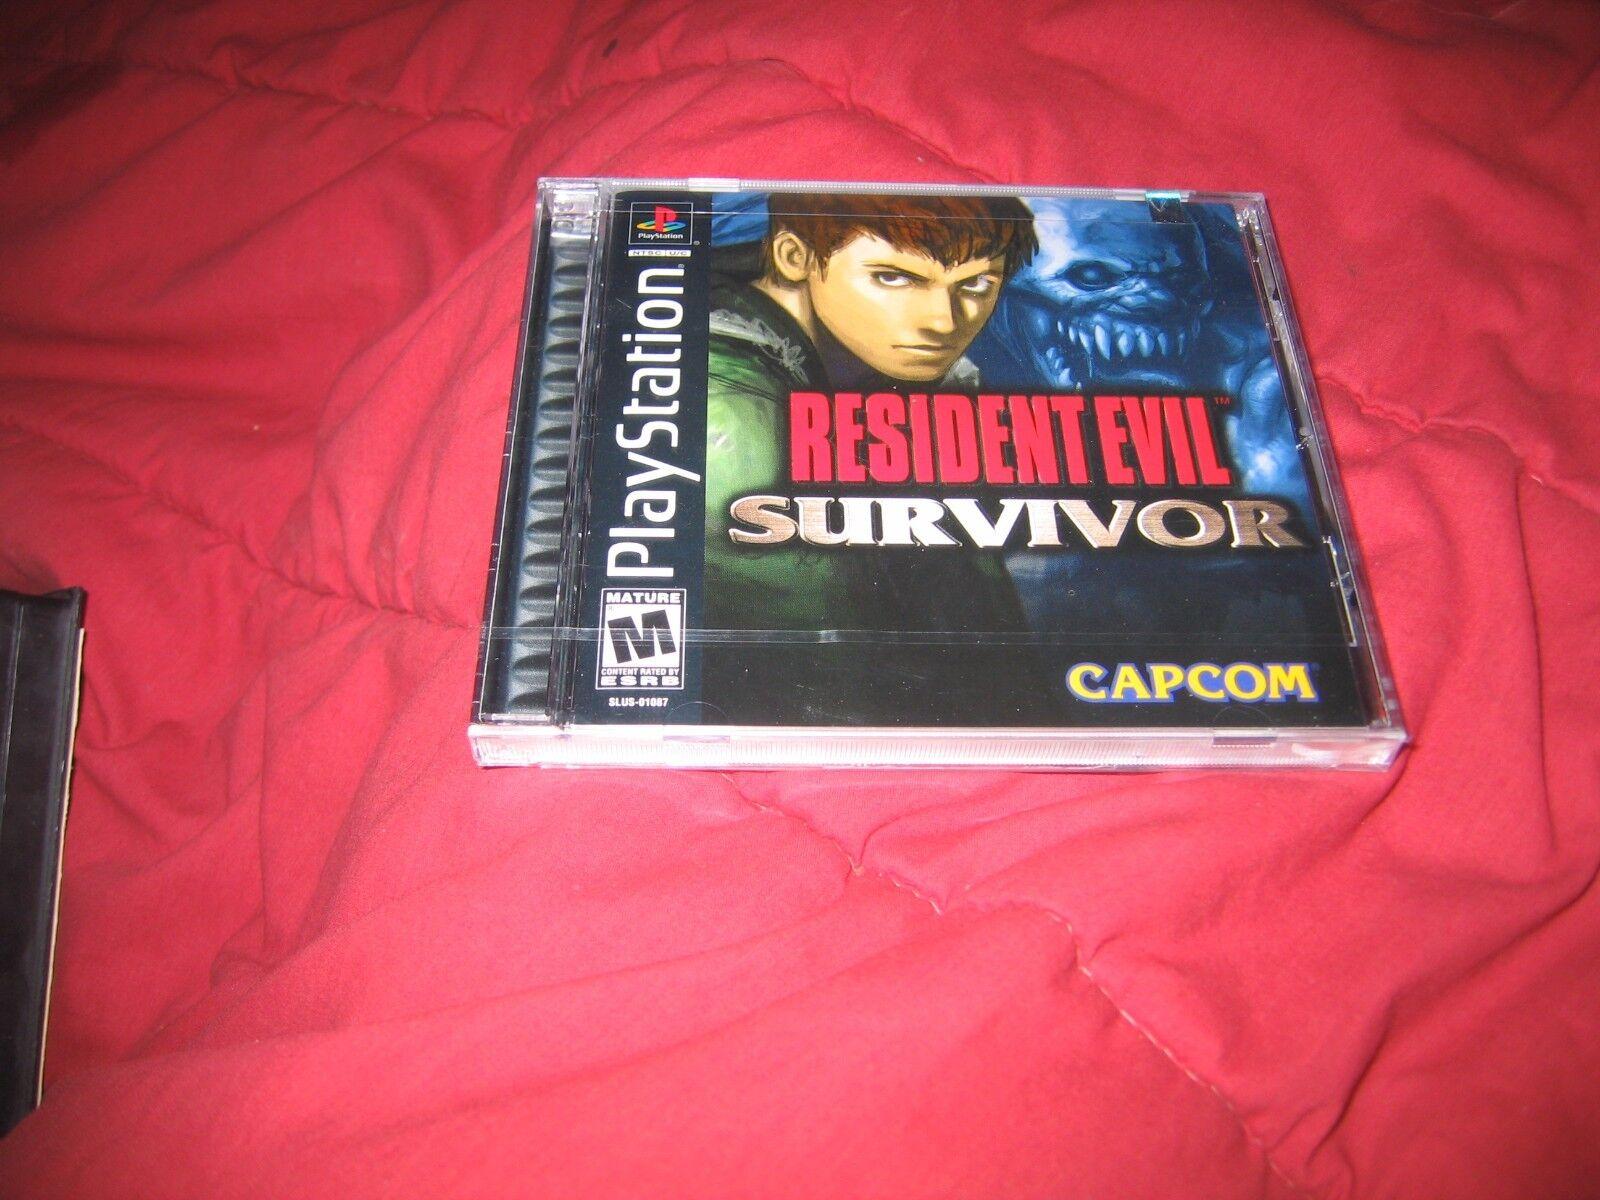 $109.99 - Sony PlayStation Resident Evil Survivor Brand New Factory Sealed PS1